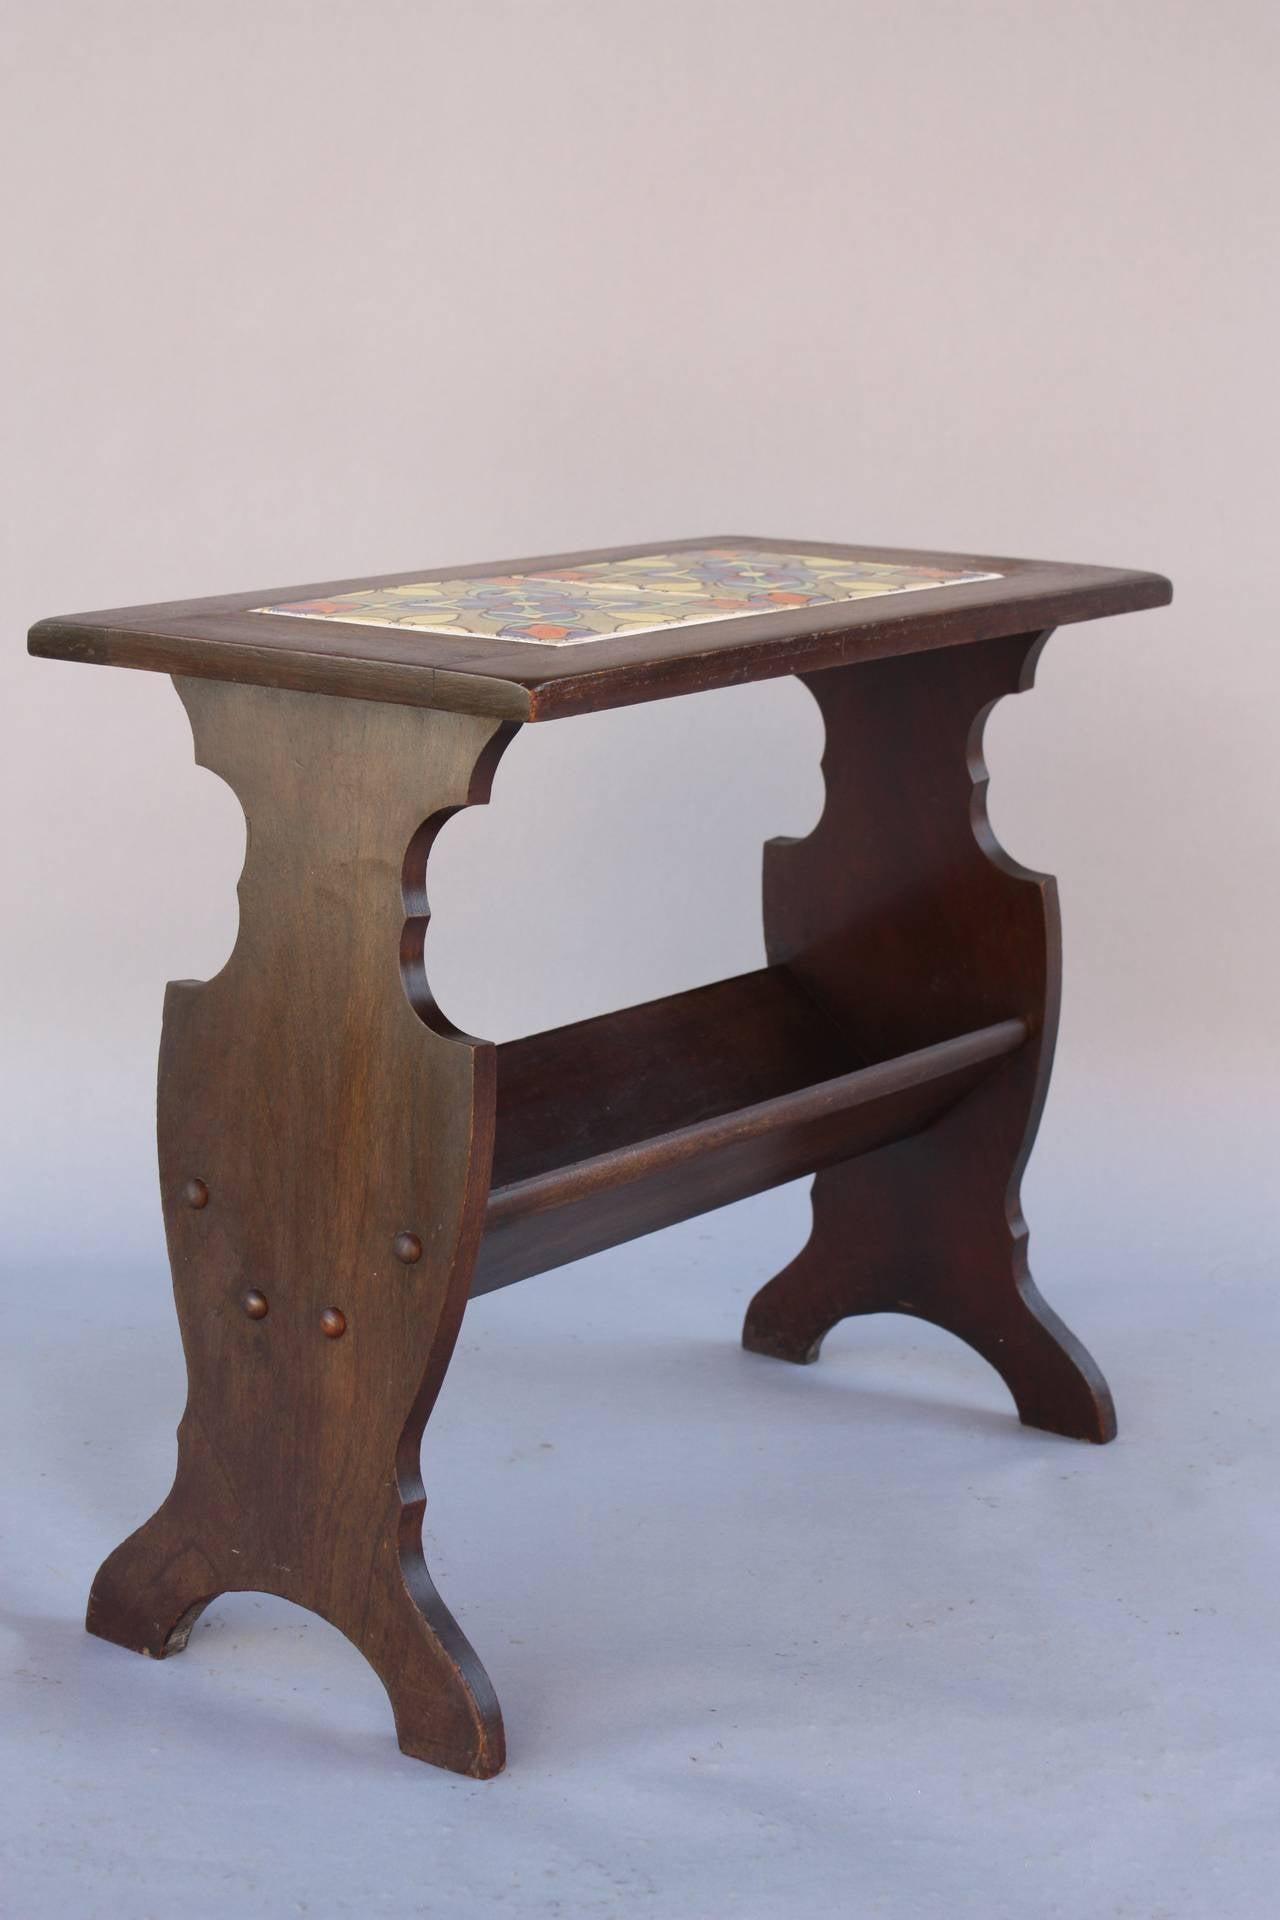 Etonnant Walnut Table With All Original Malibu Tile Table / Magazine Stand. 21